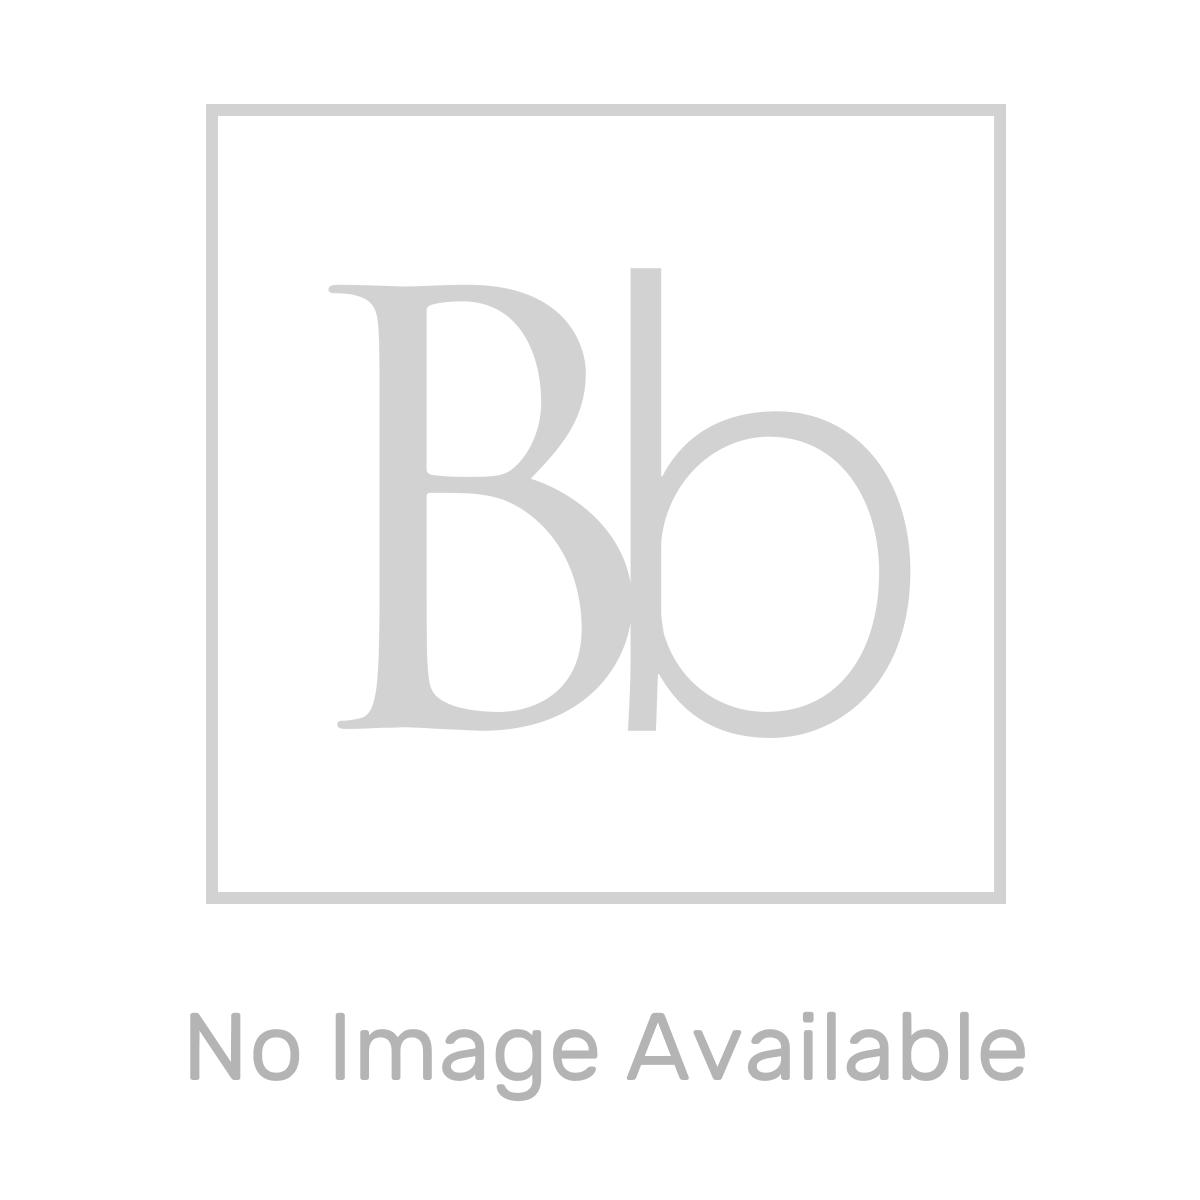 RAK Surface Charcoal Matt Tile 600 x 1200mm Lifestyle